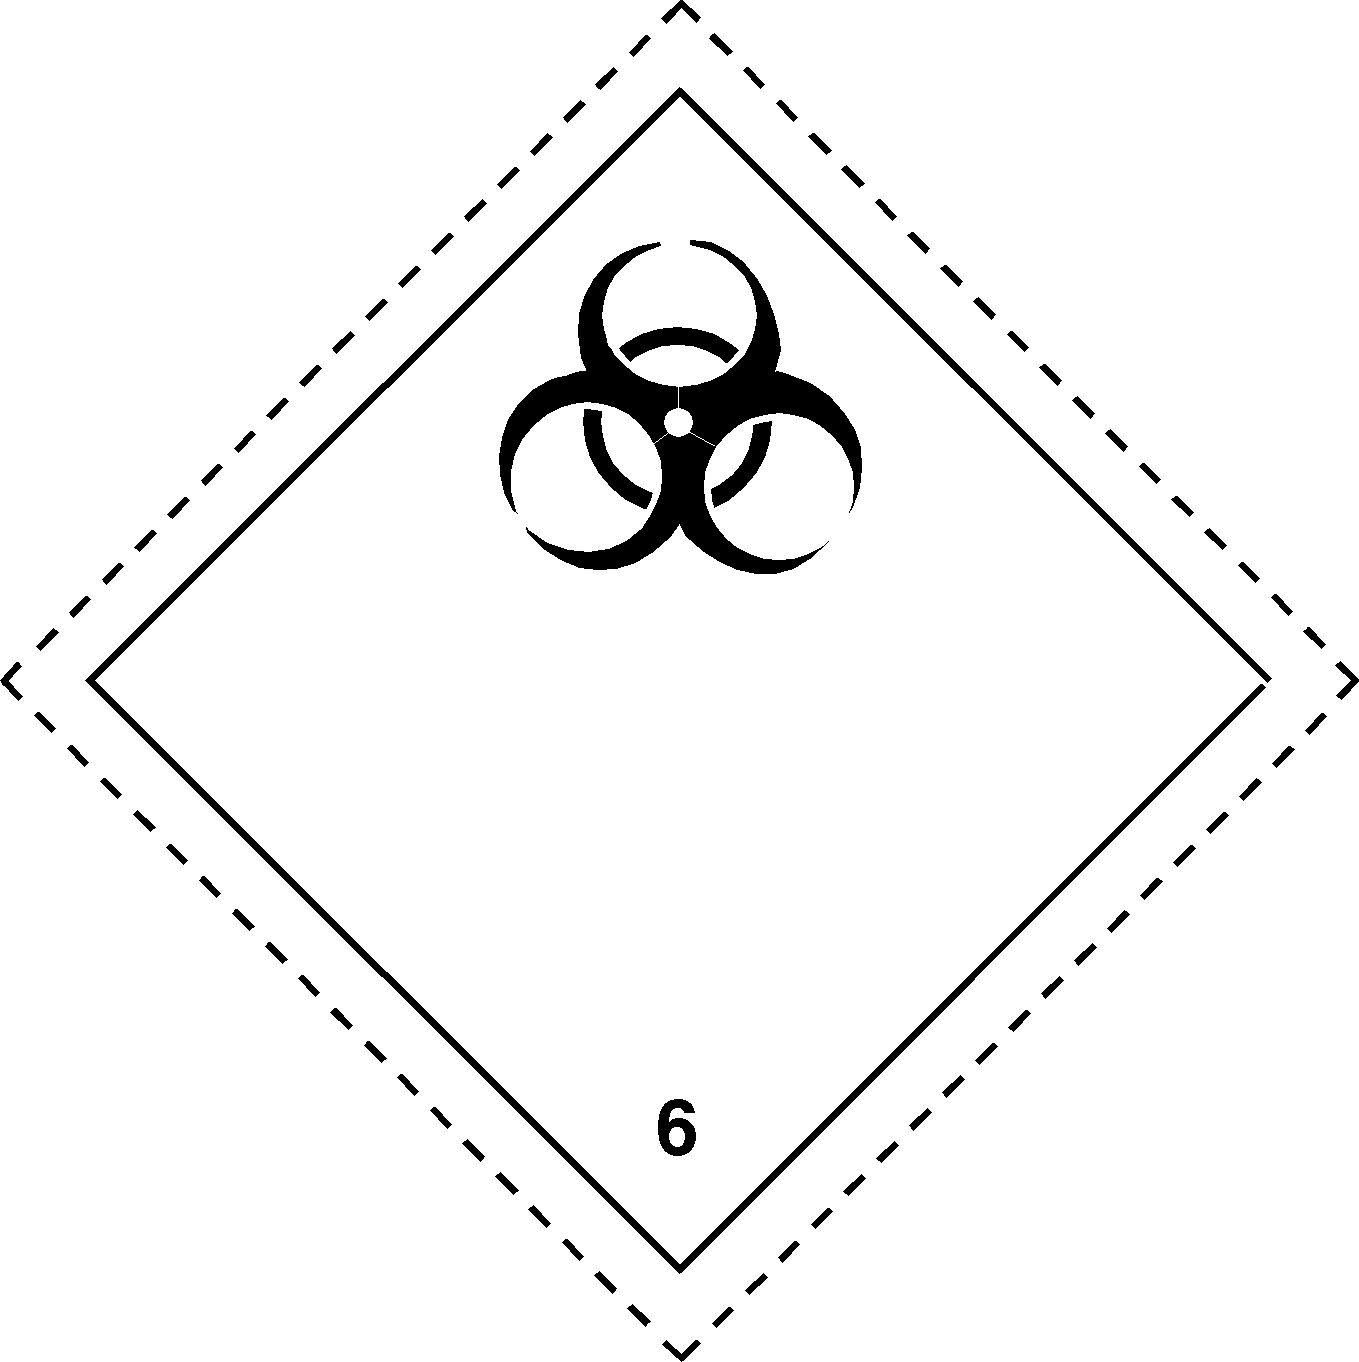 dgr-n-lbl-c6infectious62-p